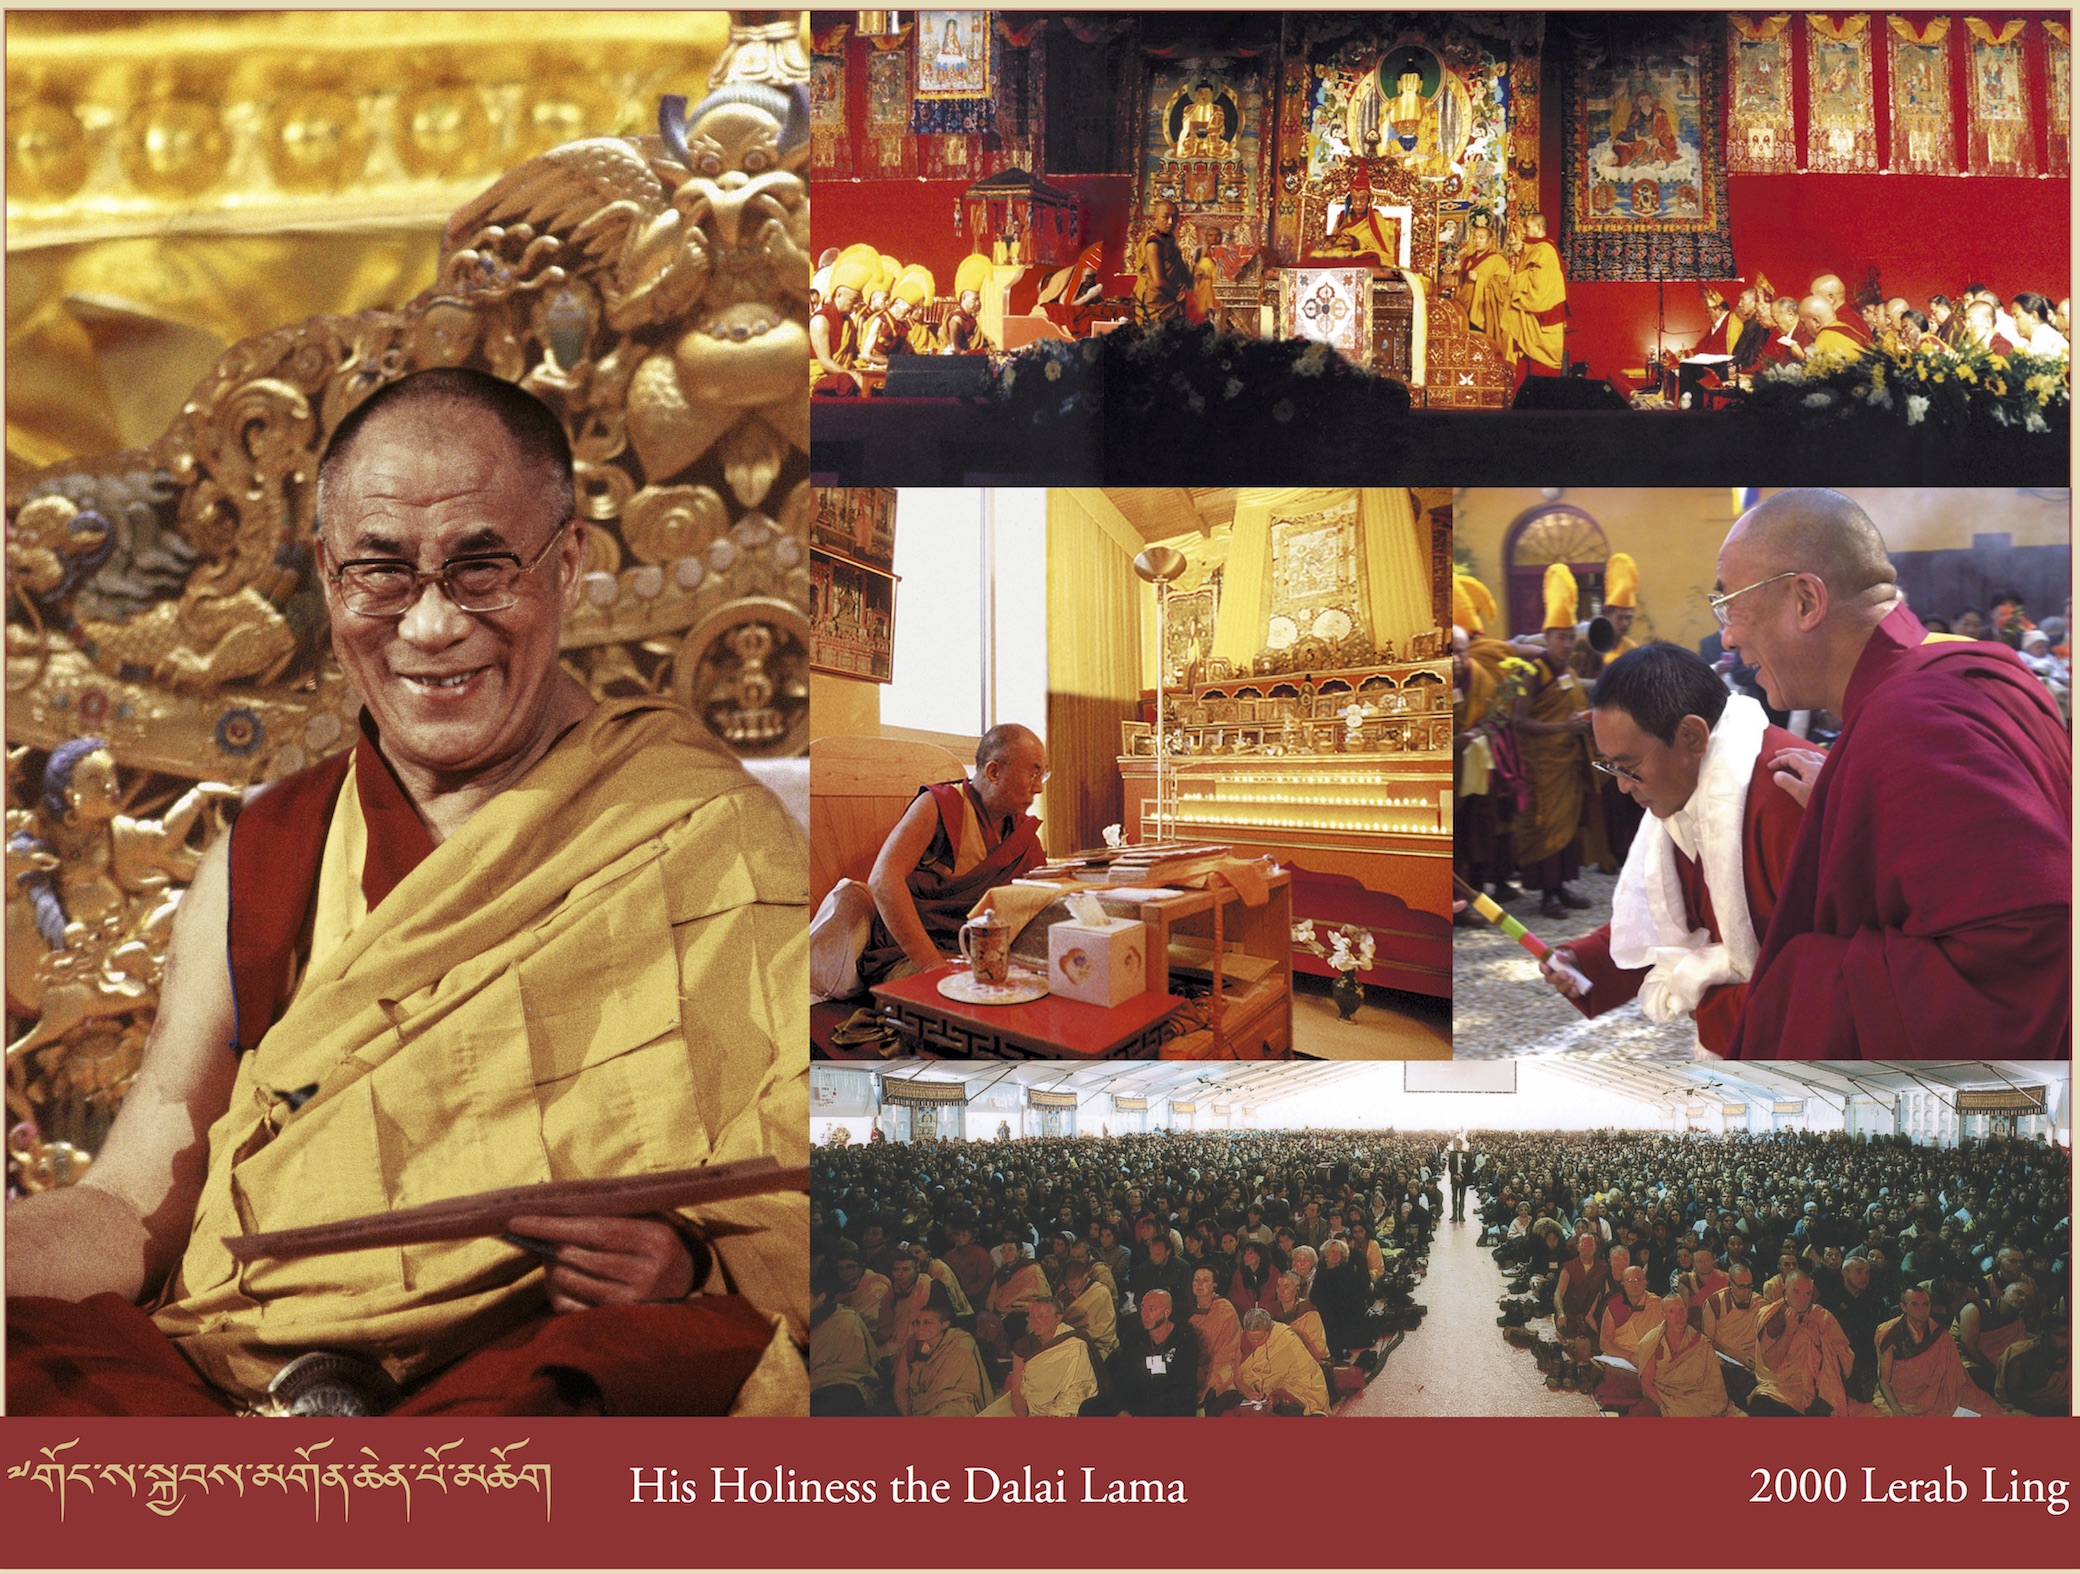 His Holiness the Dalai Lama, 2000 Lerab Ling